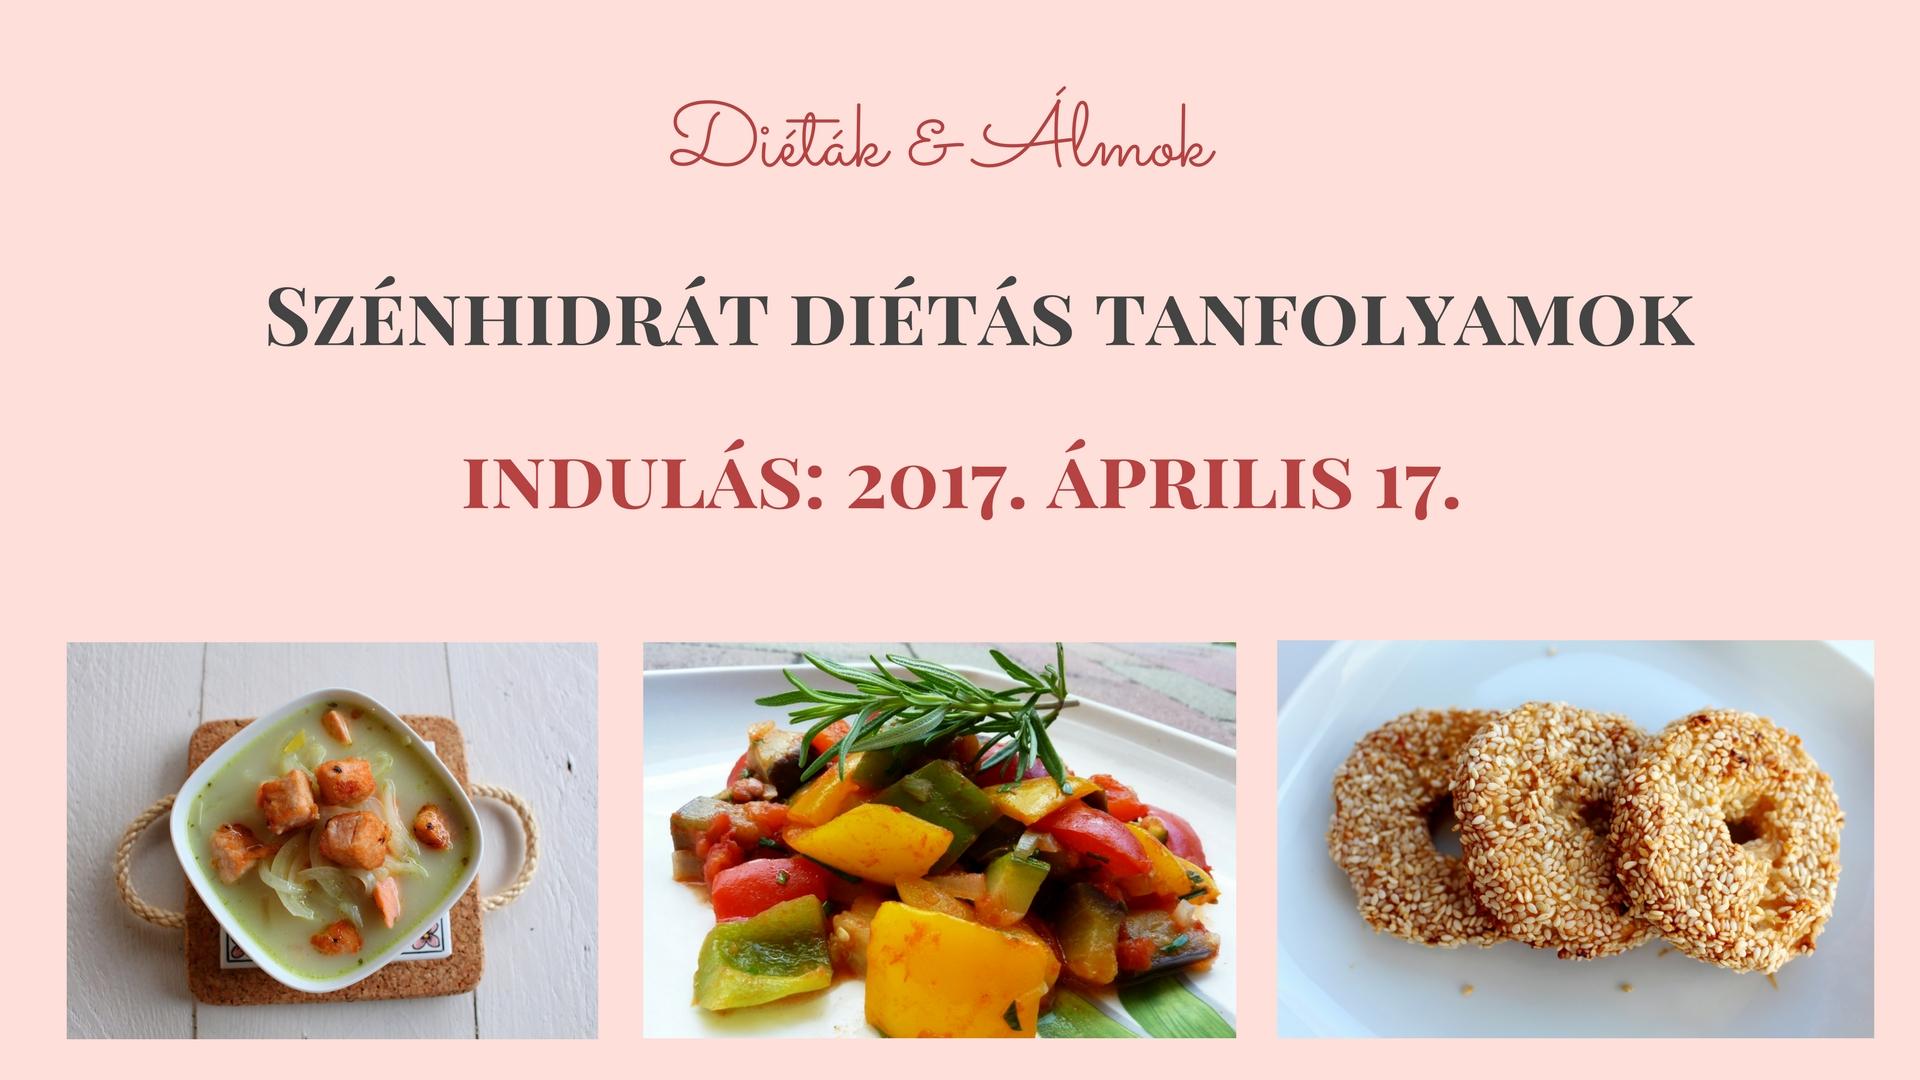 blogra_-szenhidrat_dietas_online_tanfolyam_aprilis_1.jpg